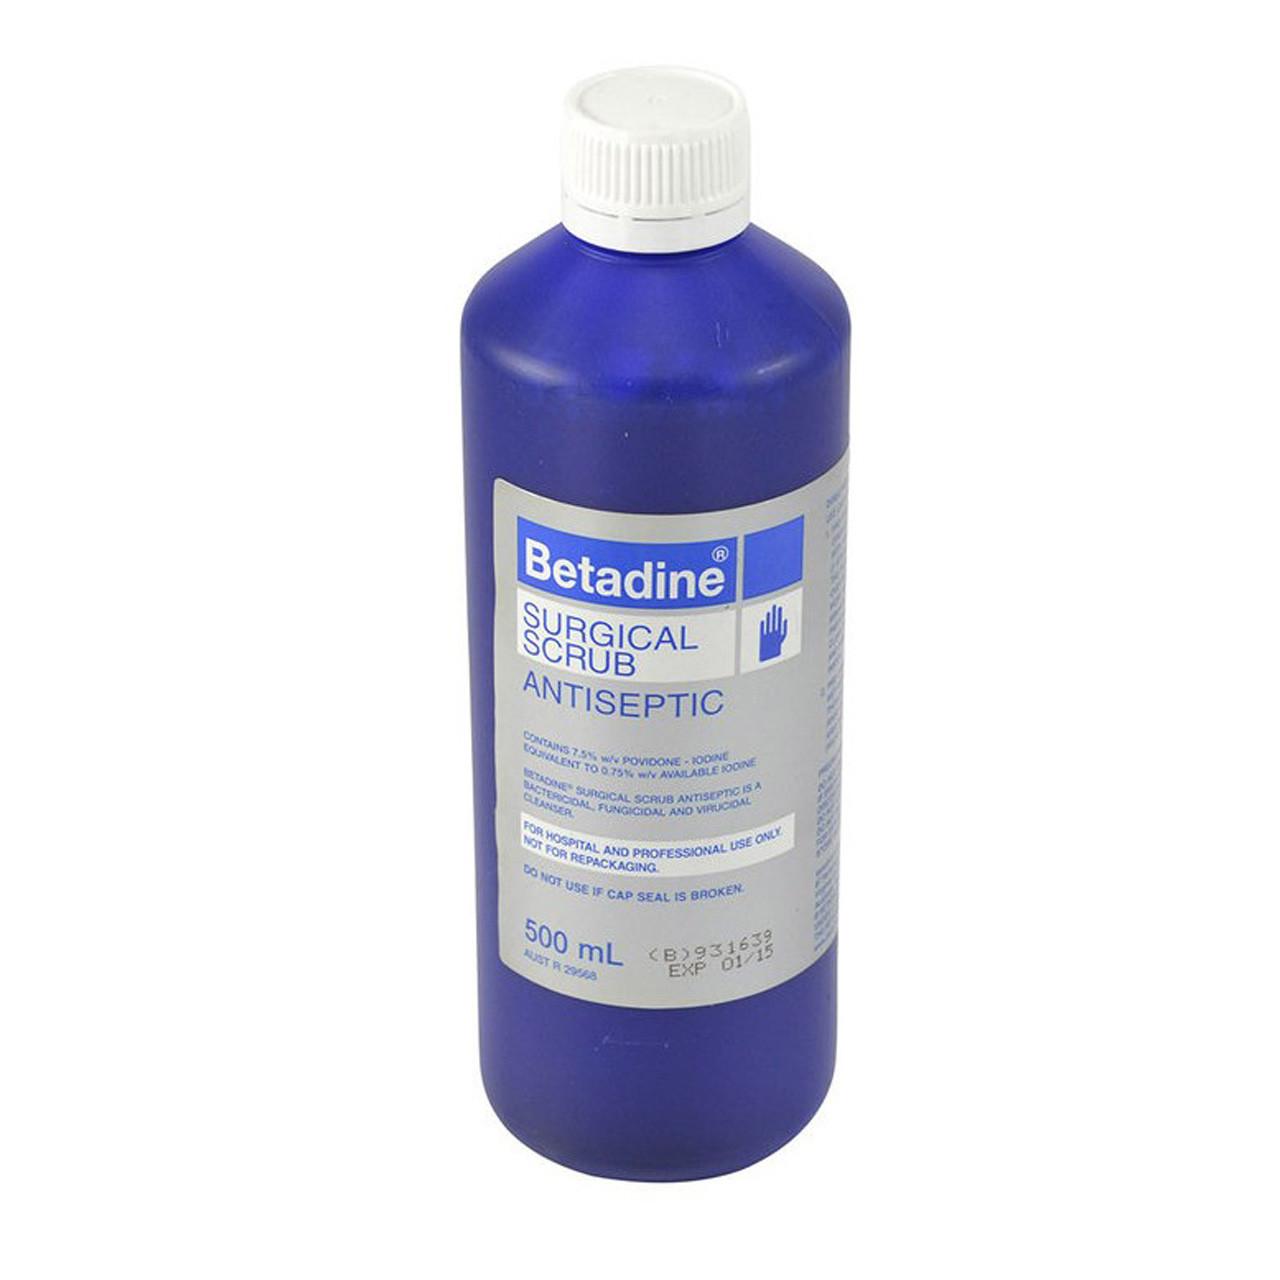 Betadine Povidone Iodine Surgical Scrub 500ml